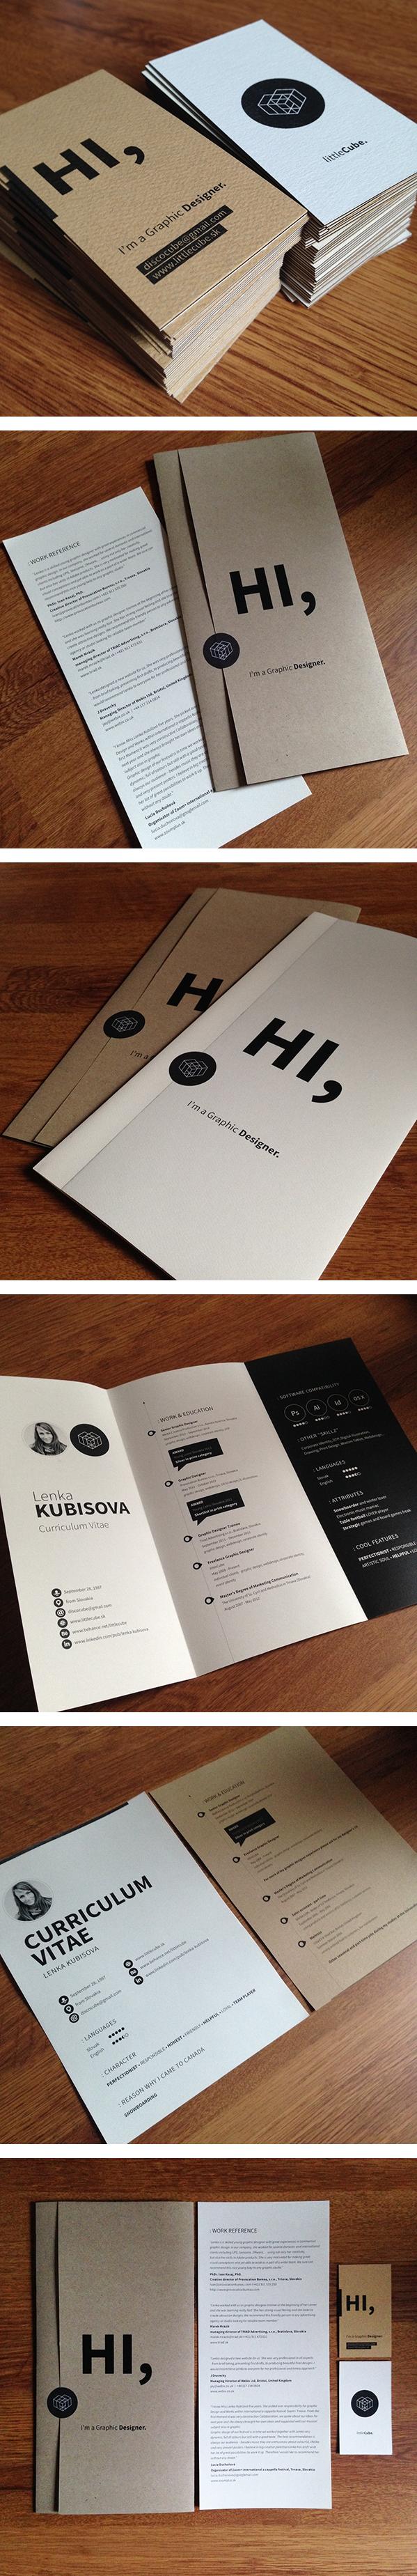 Graphic Designer Resume Business Cards By Lenka Kubisova